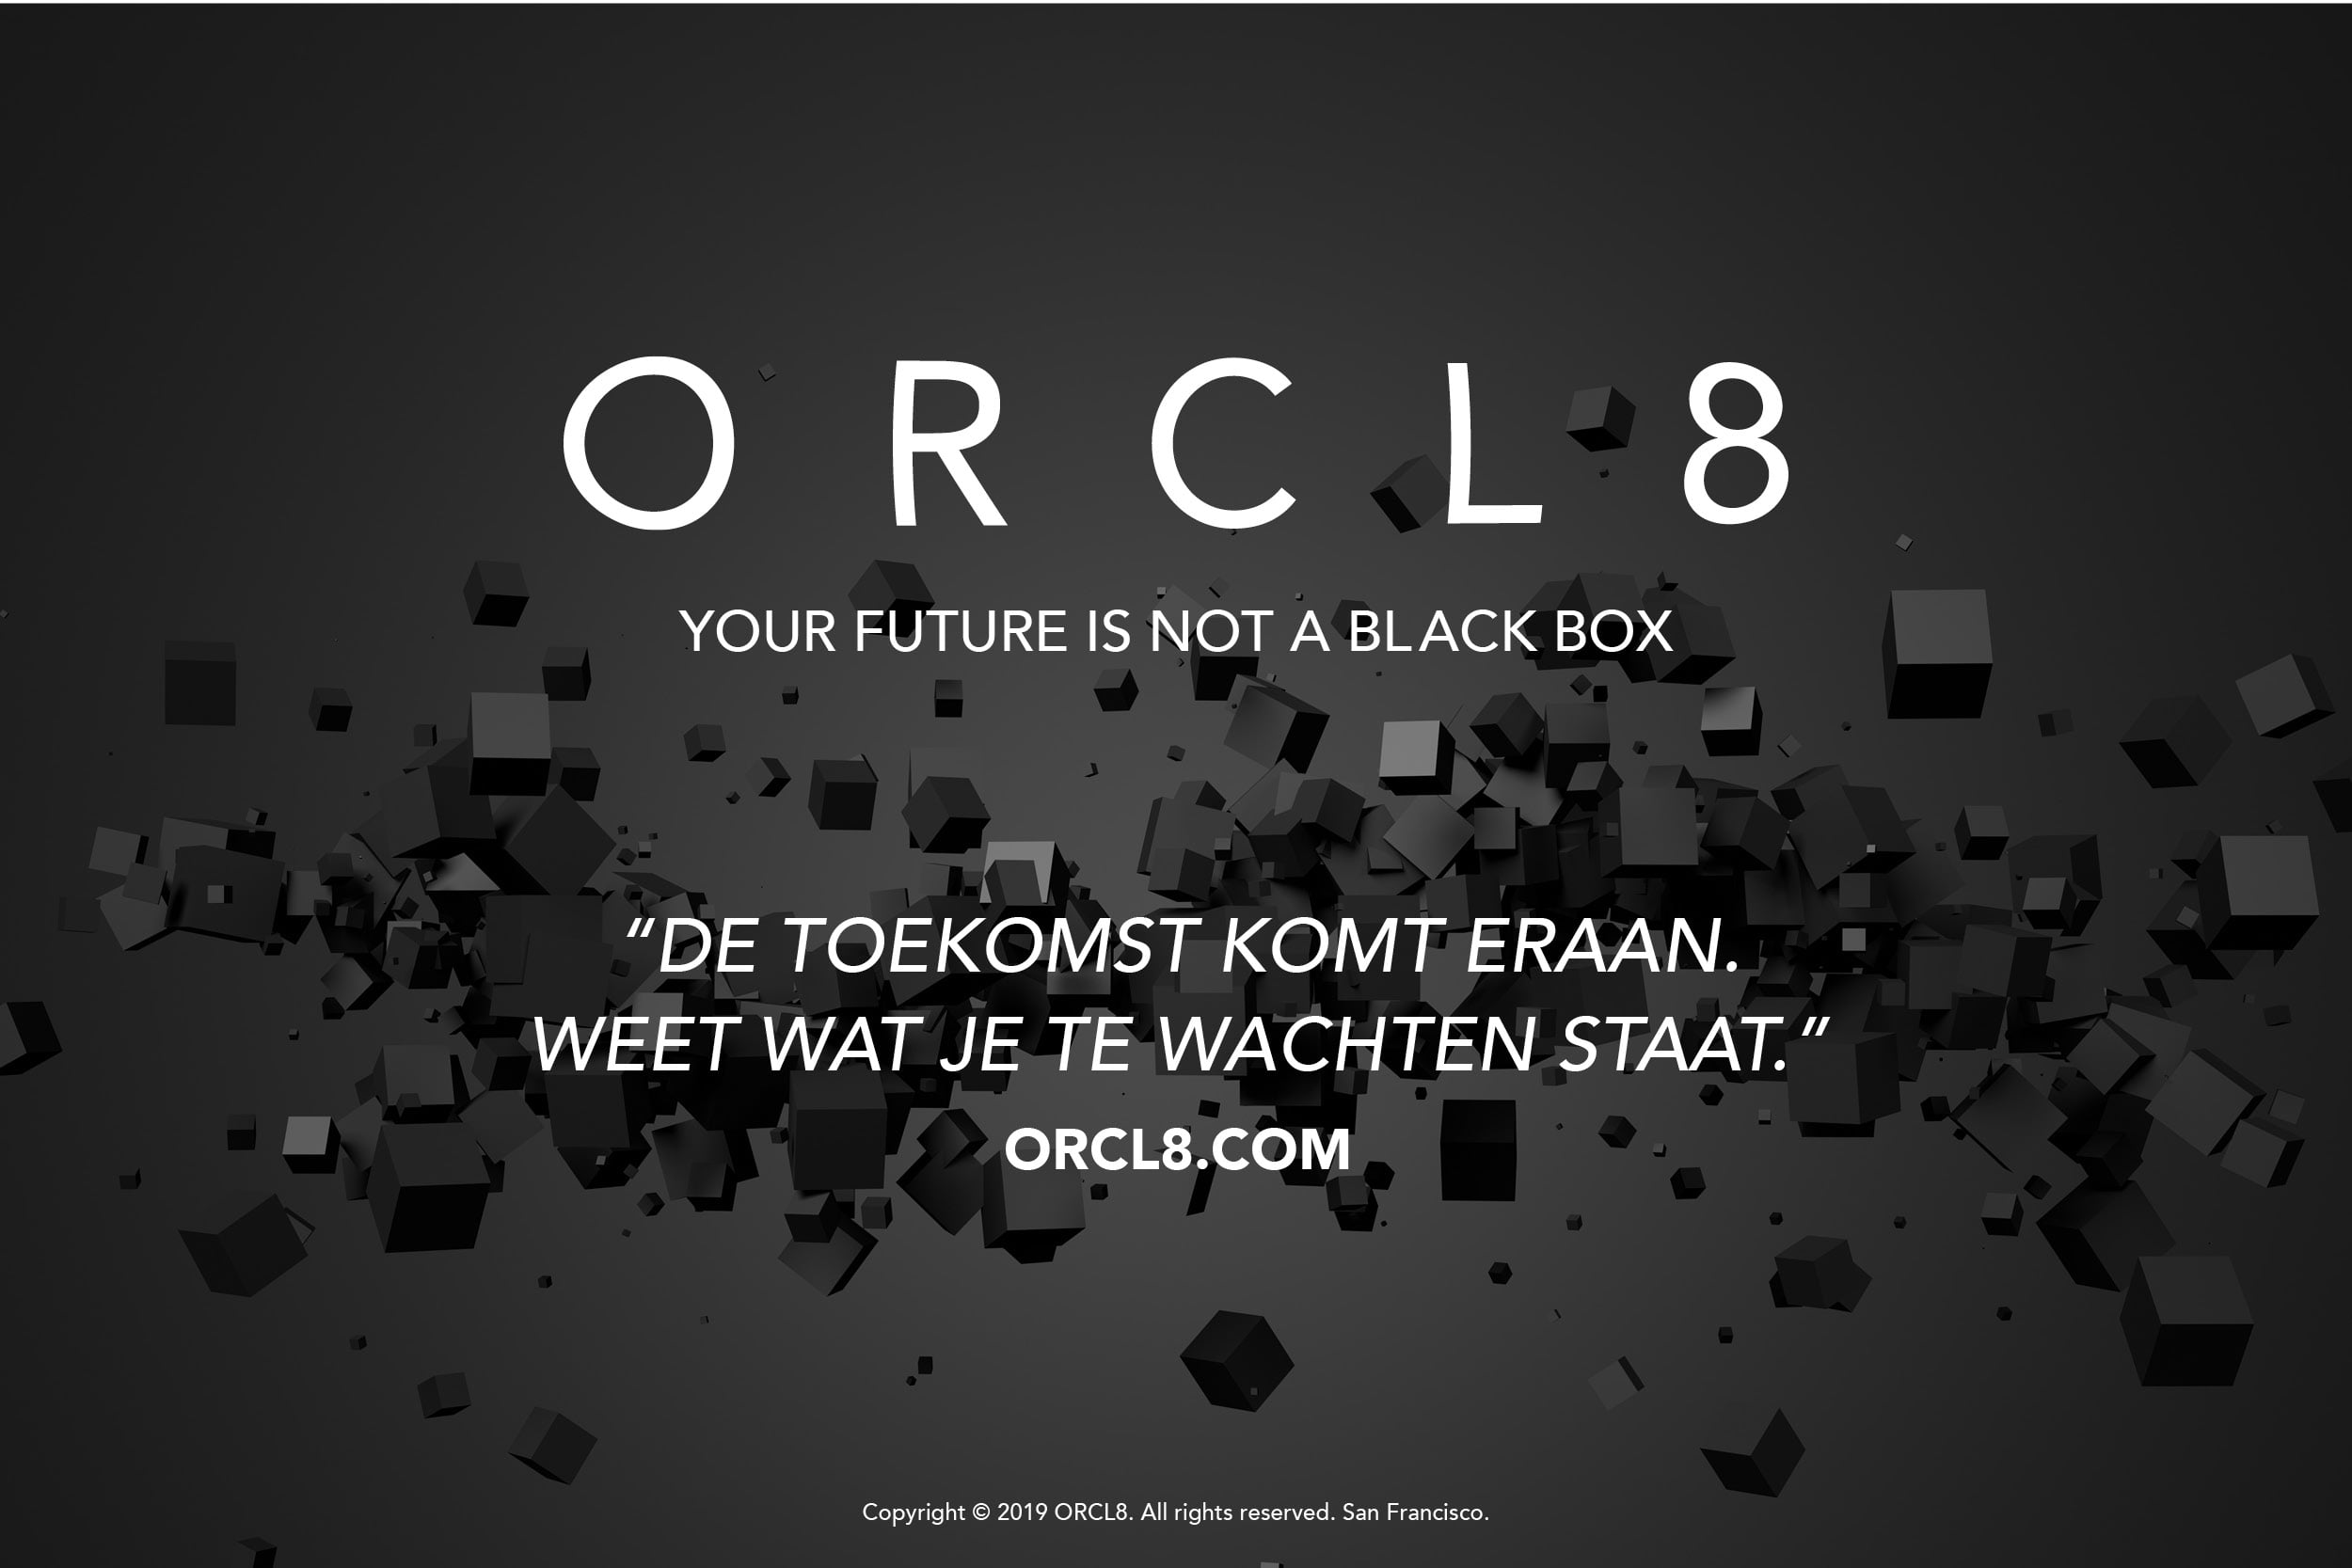 Lancering ORLC8: ben jij al futureproof?